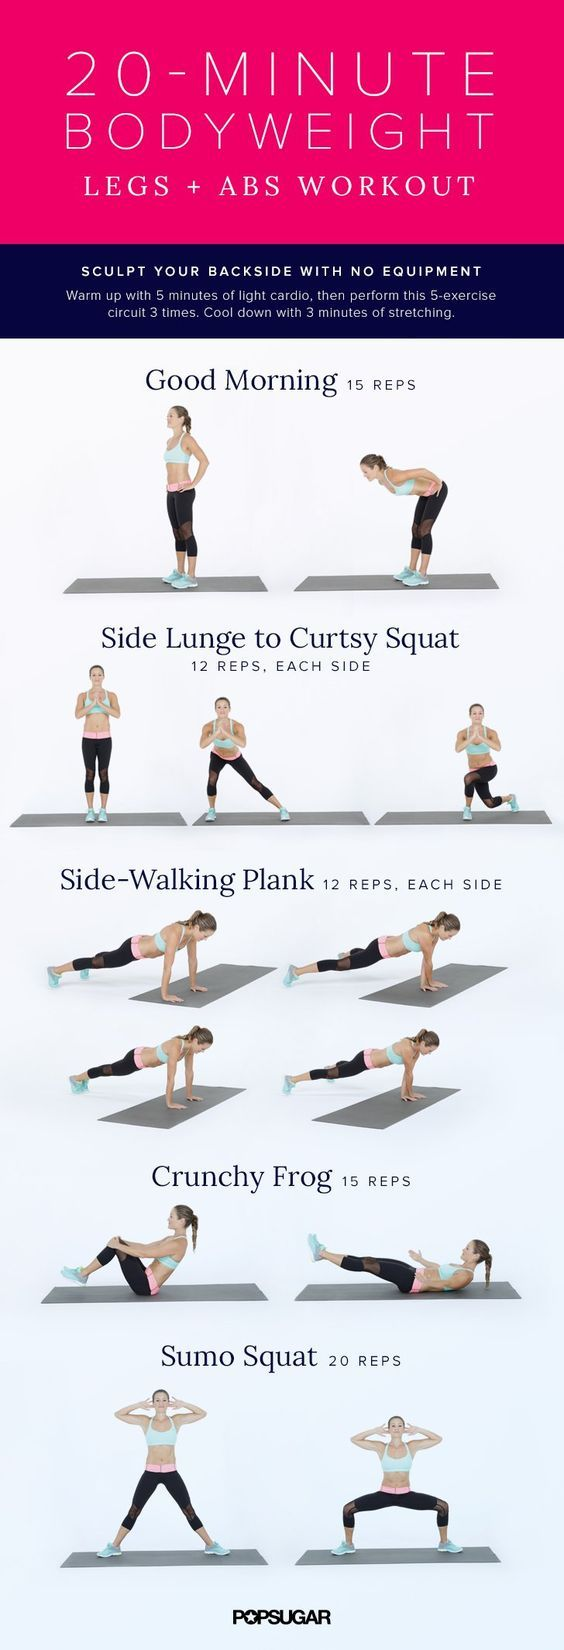 20-Minute Legs + Abs Bodyweight Workout